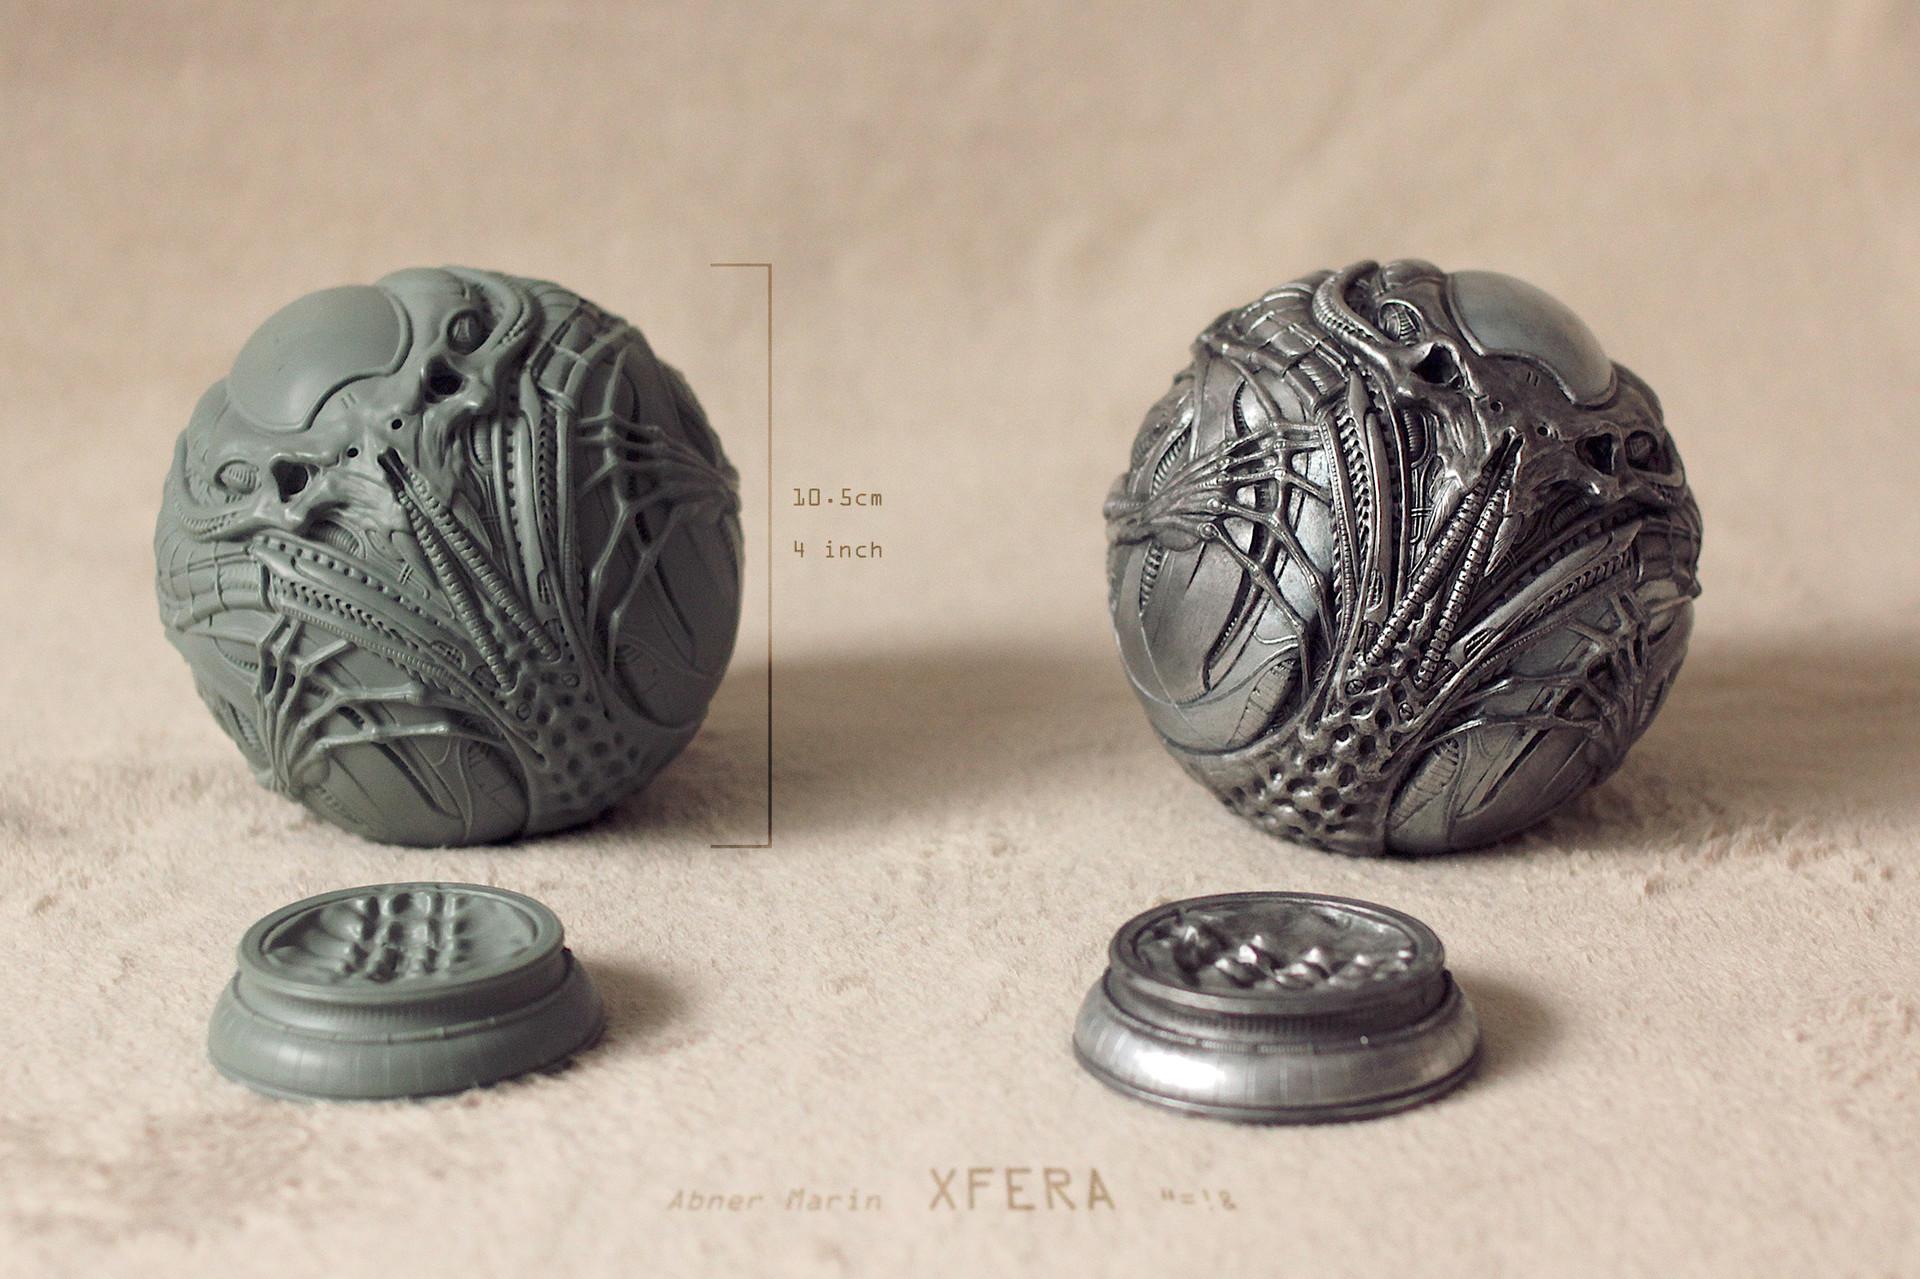 Abner marin xfera both 01 measurements small